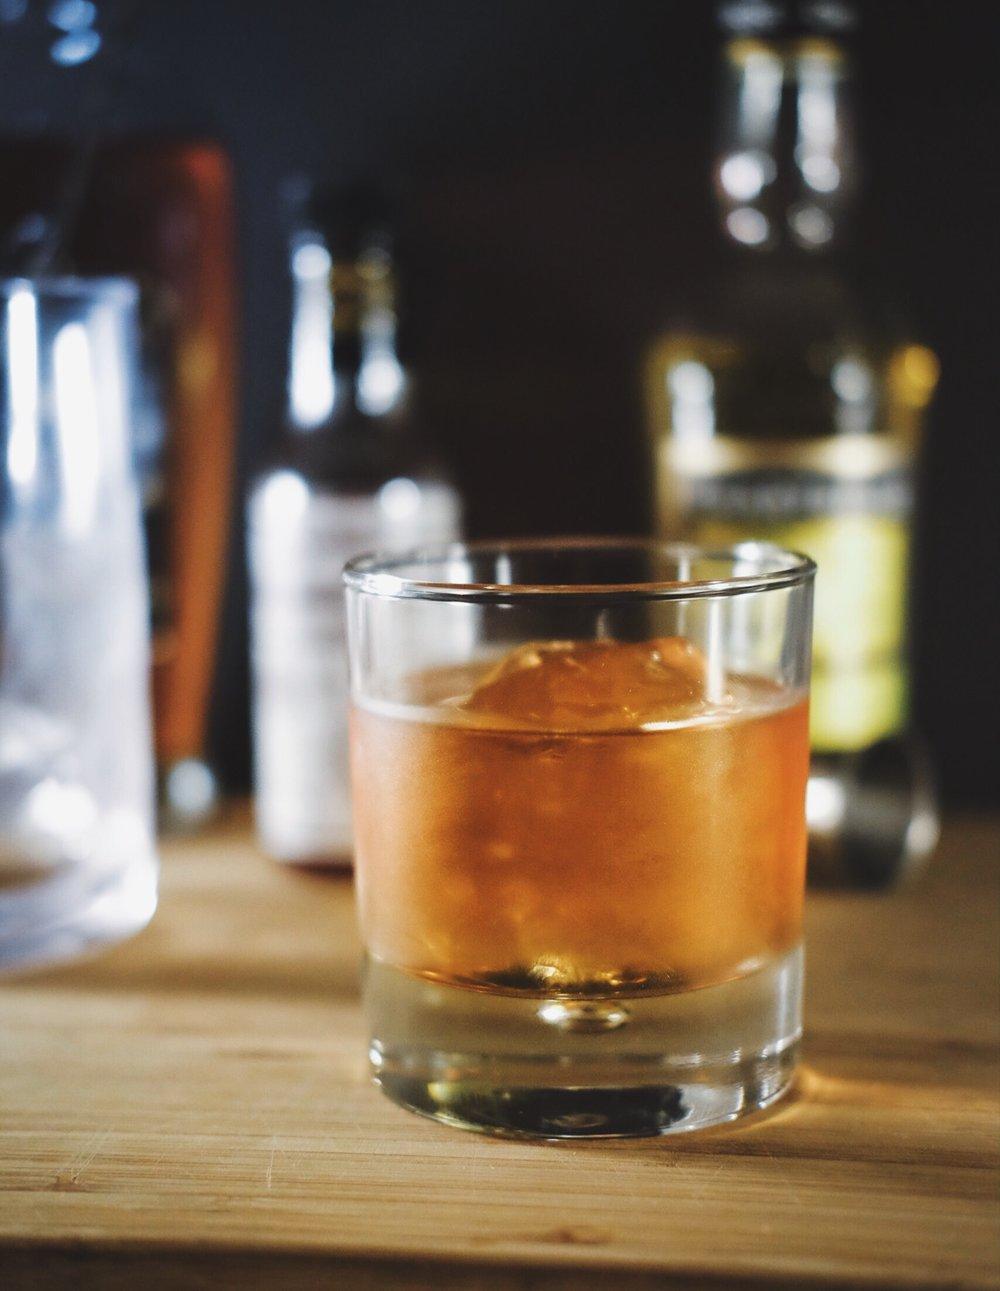 ingredients: - 2 oz lightly aged rum1/2 oz apple brandy1/2 oz yellow chartreuse1 tsp true grenadine1 dash Peychaud's bitters